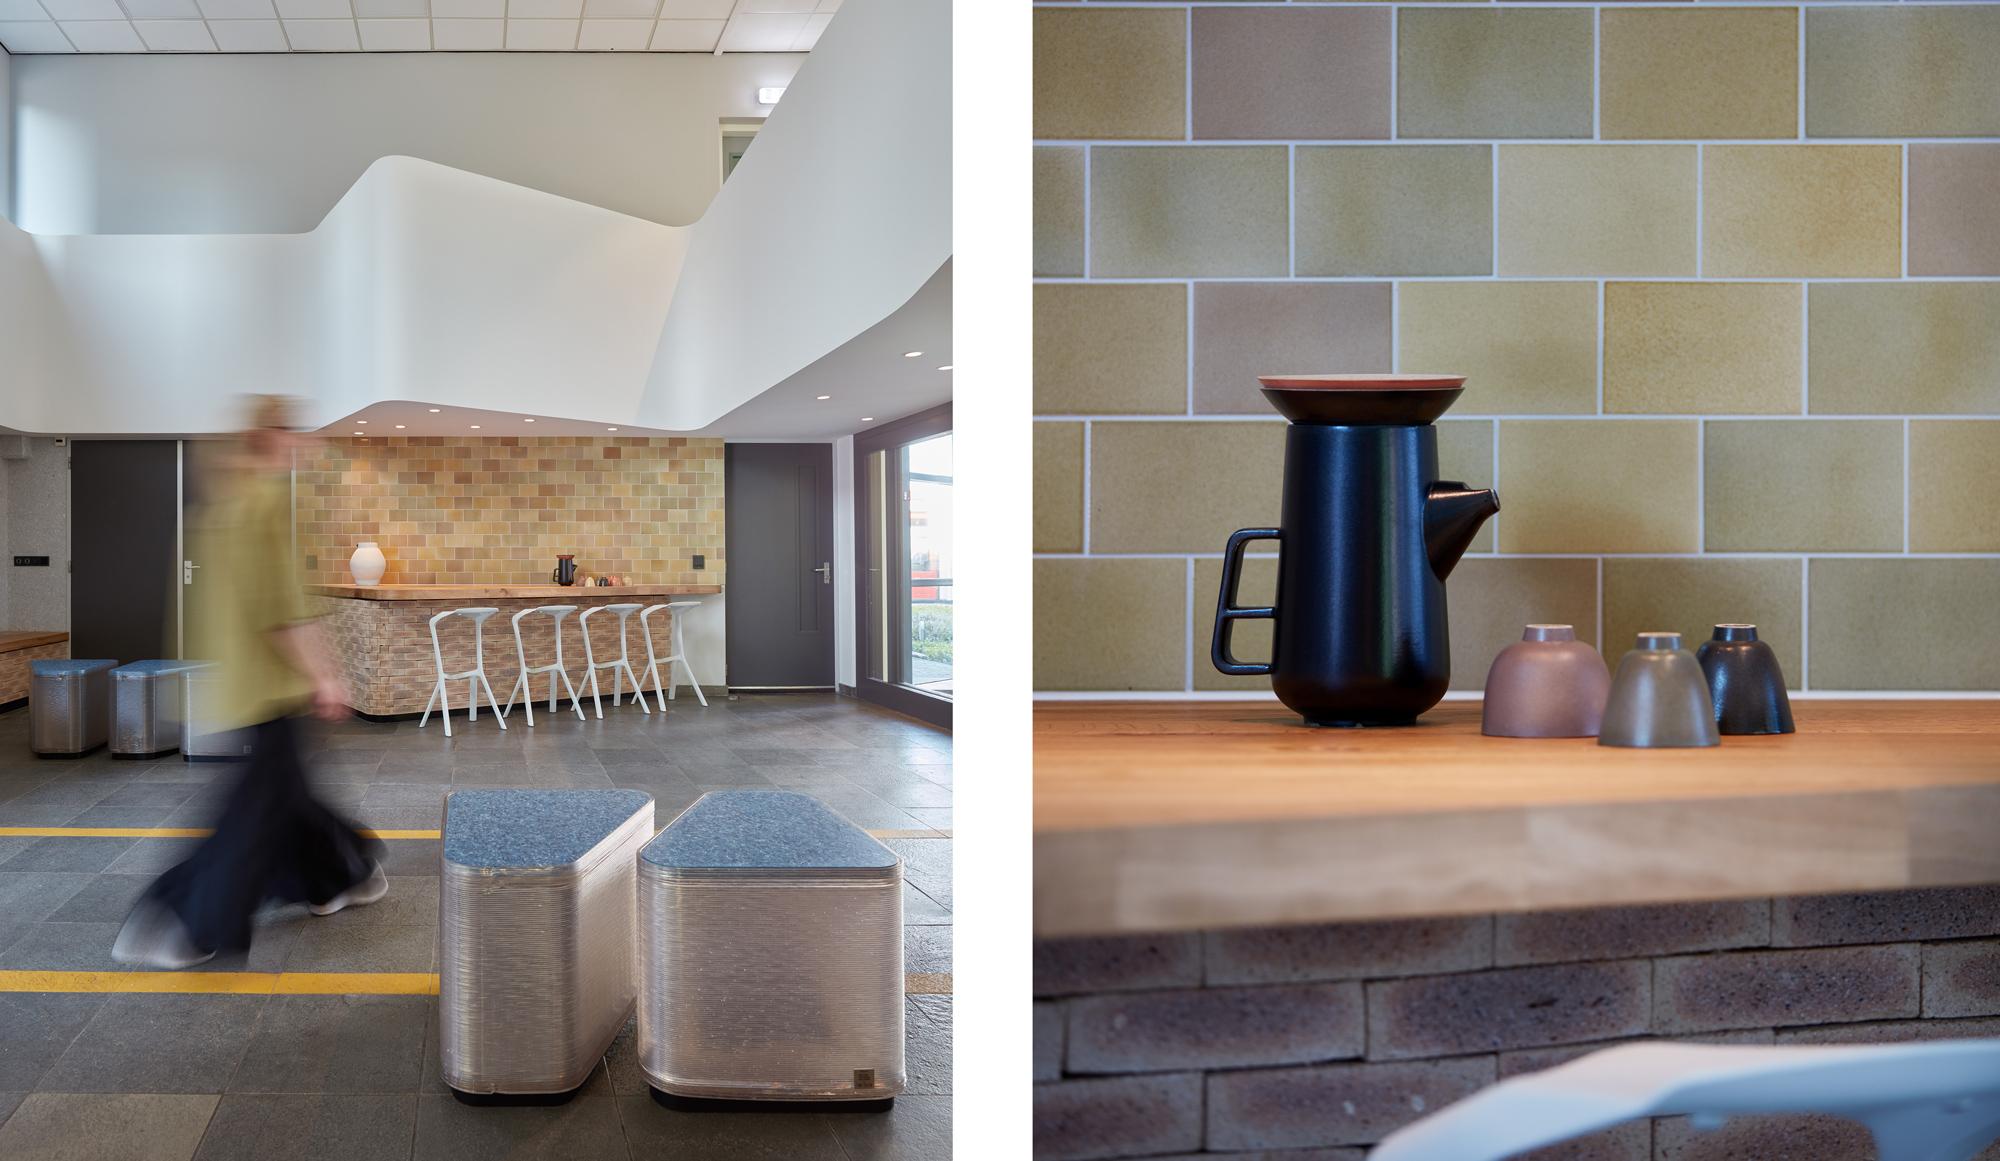 Studio-Mixtura-tiles-ceramics-waste-architect